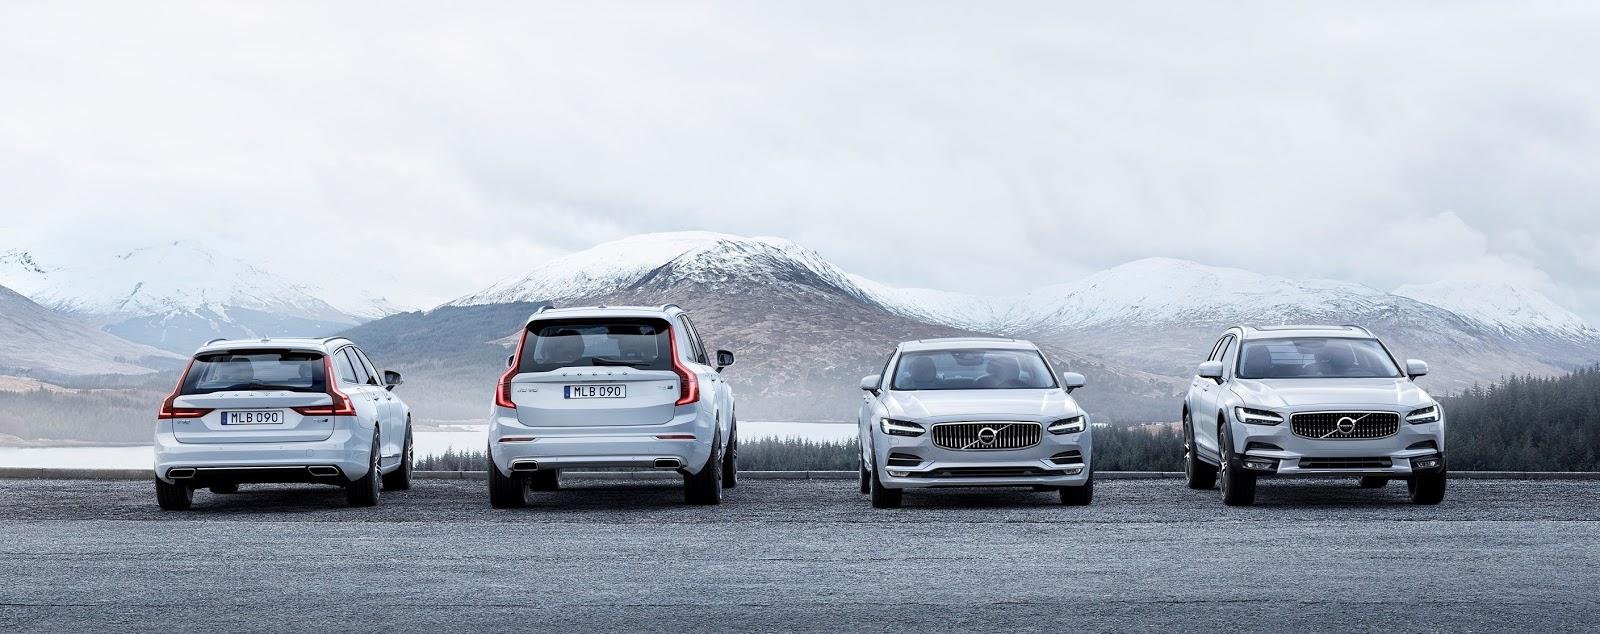 VOLVO2B902BSERIES Τα τρία ασφαλέστερα αυτοκίνητα κατά τον Euro NCAP είναι Volvo Euro NCAP, Safety, Volvo, ασφάλεια